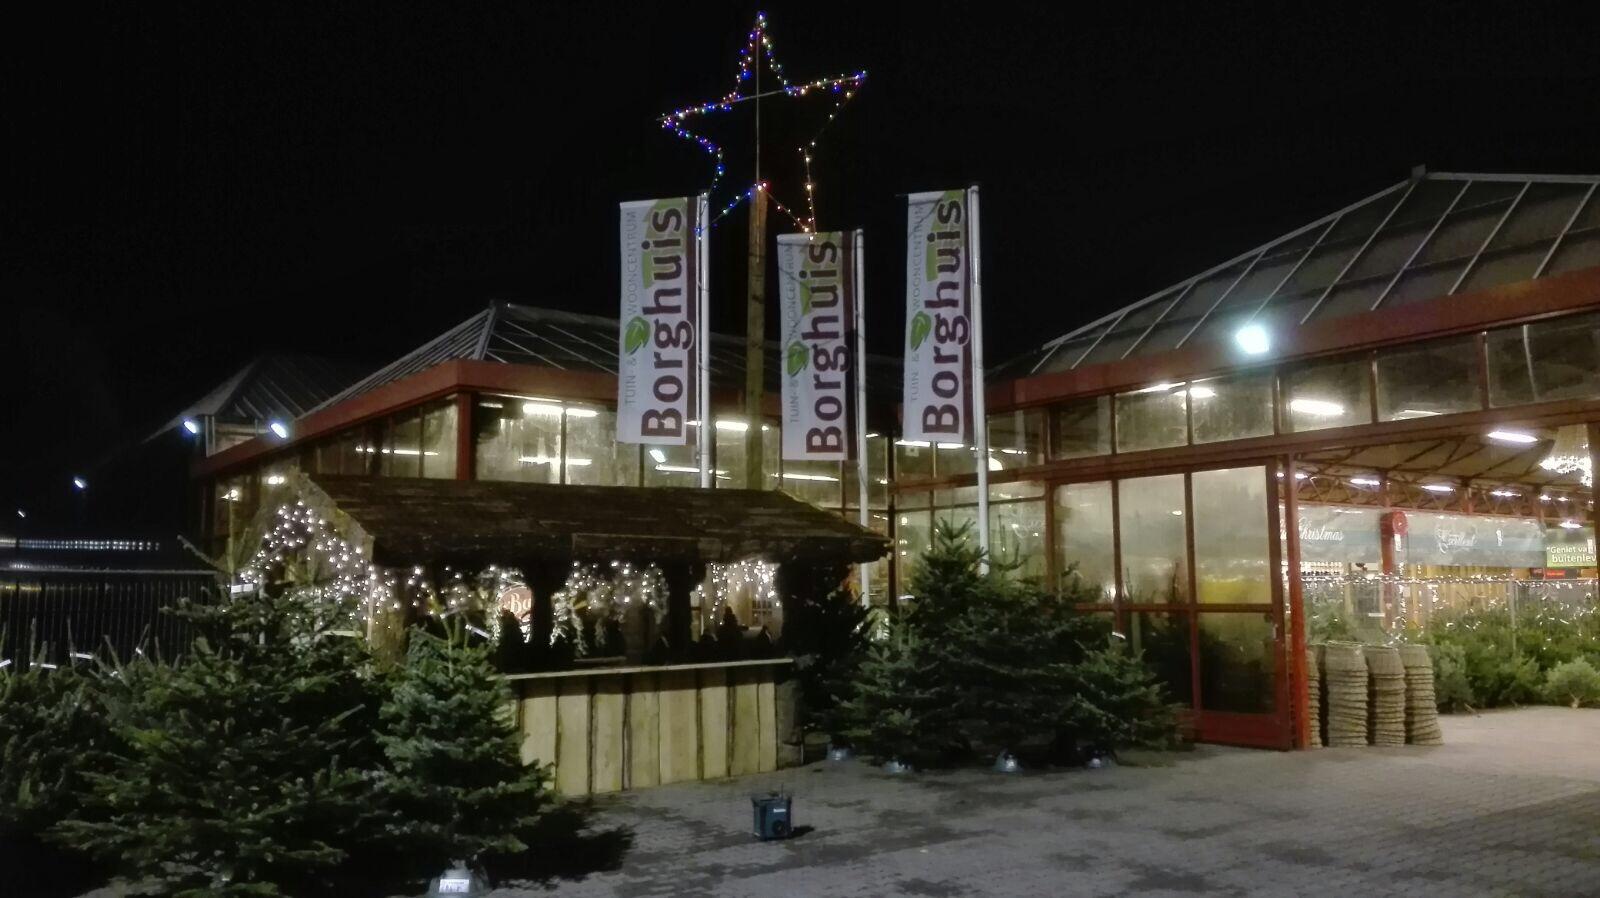 Kerstbomen reisverslag nieuws tuincentrum borghuis in for Borghuis deurningen